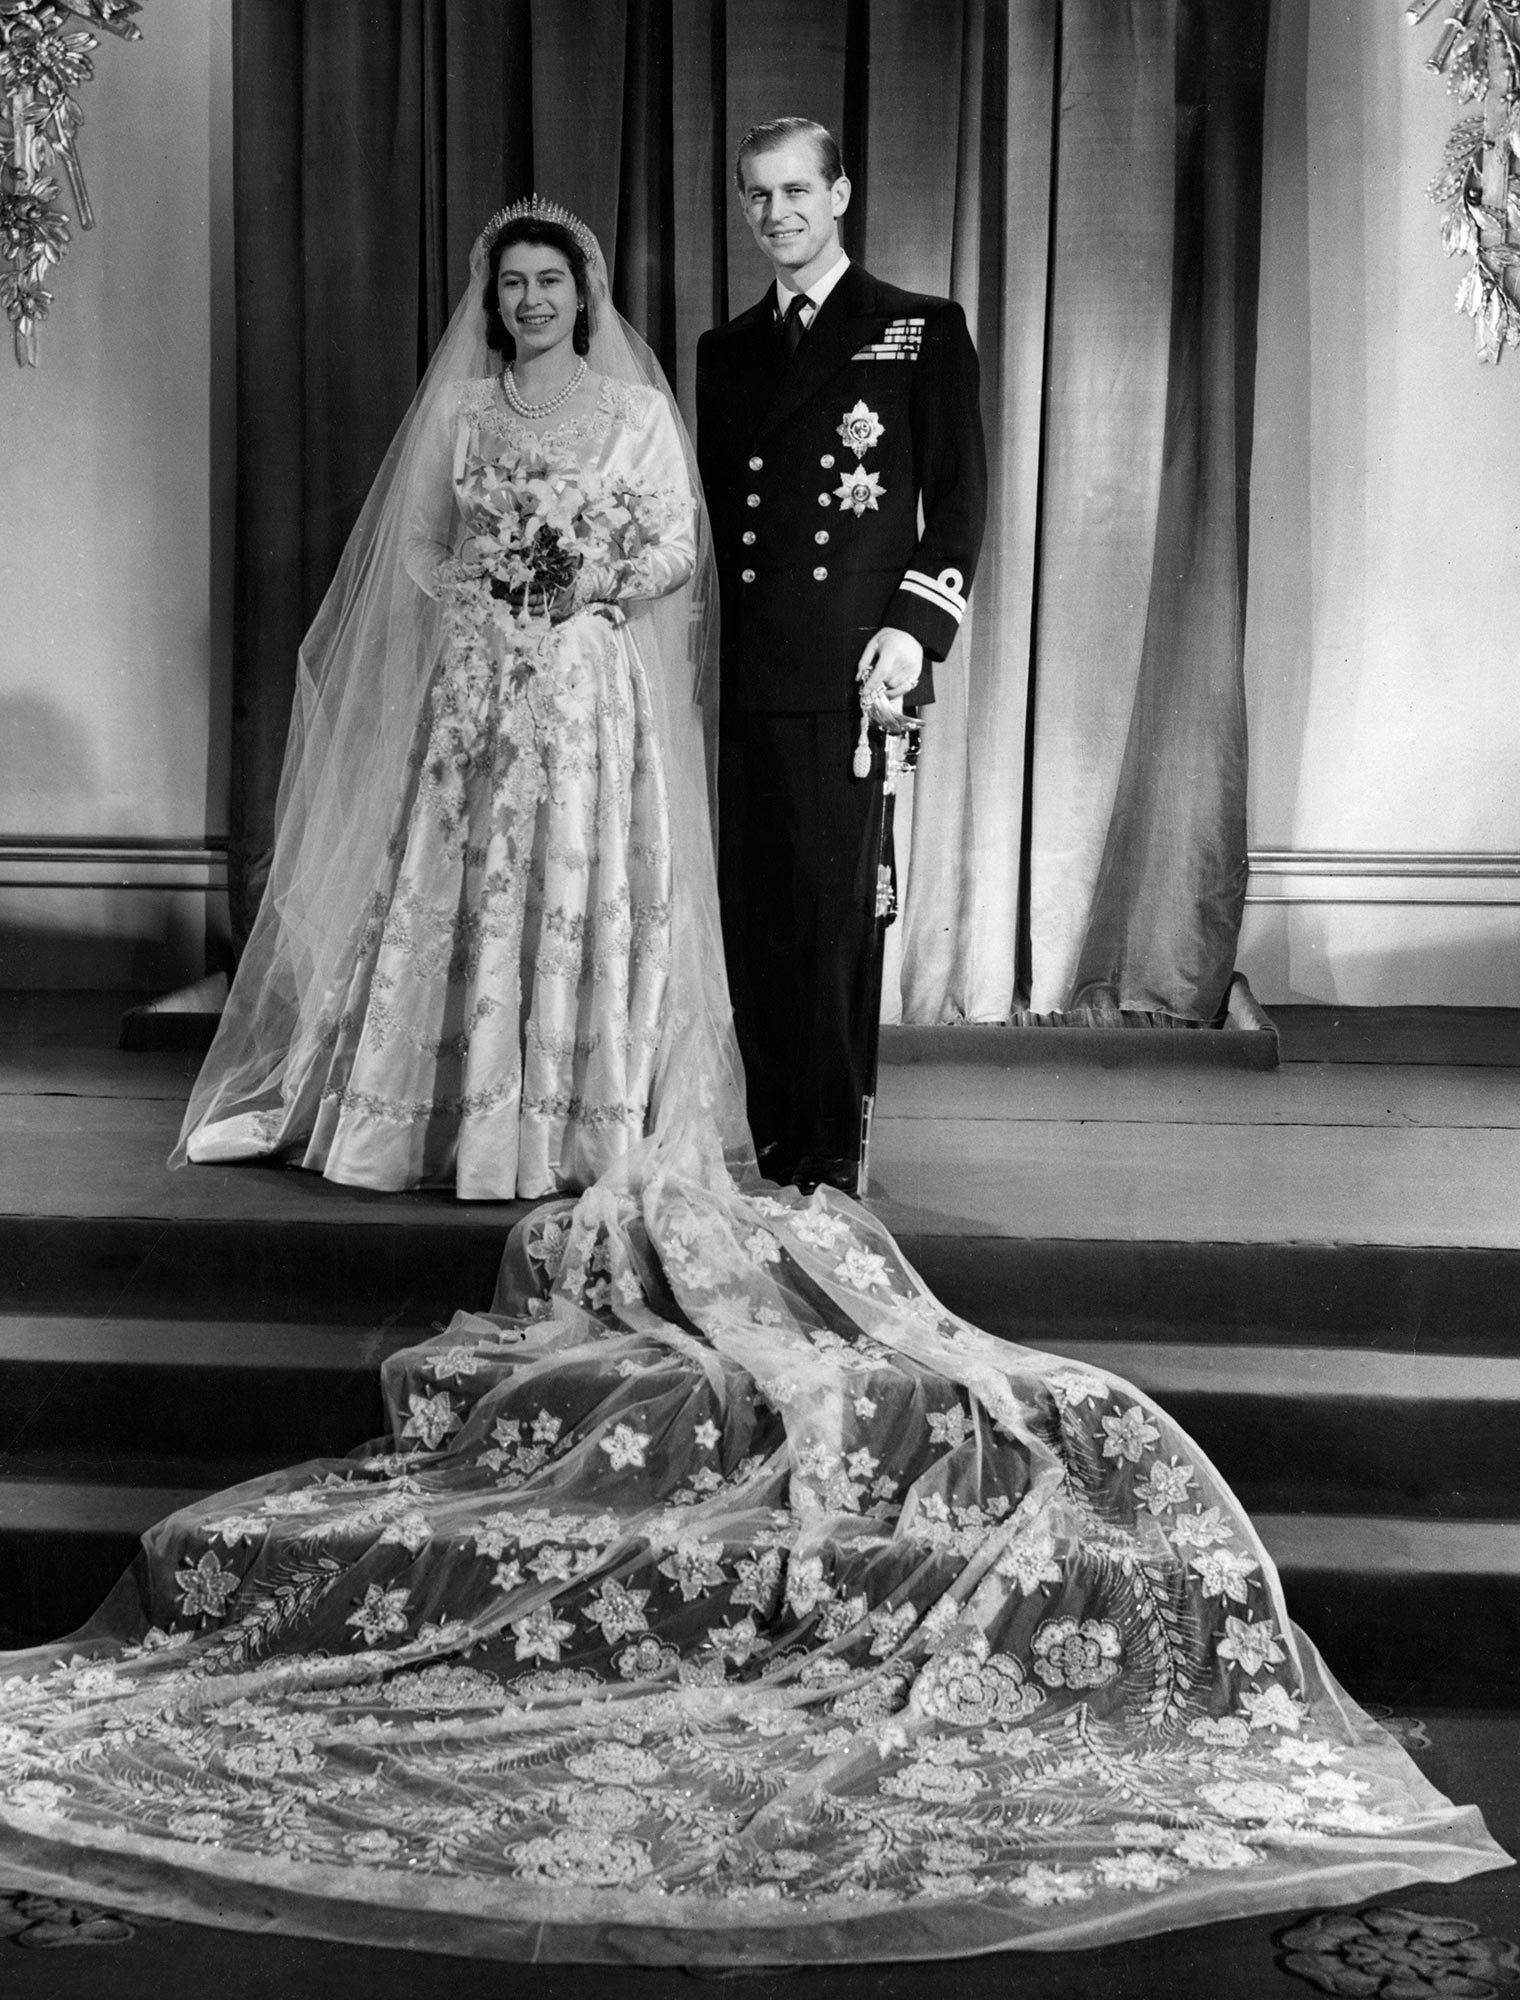 Queen Elizabeth II and Prince Philip marriage